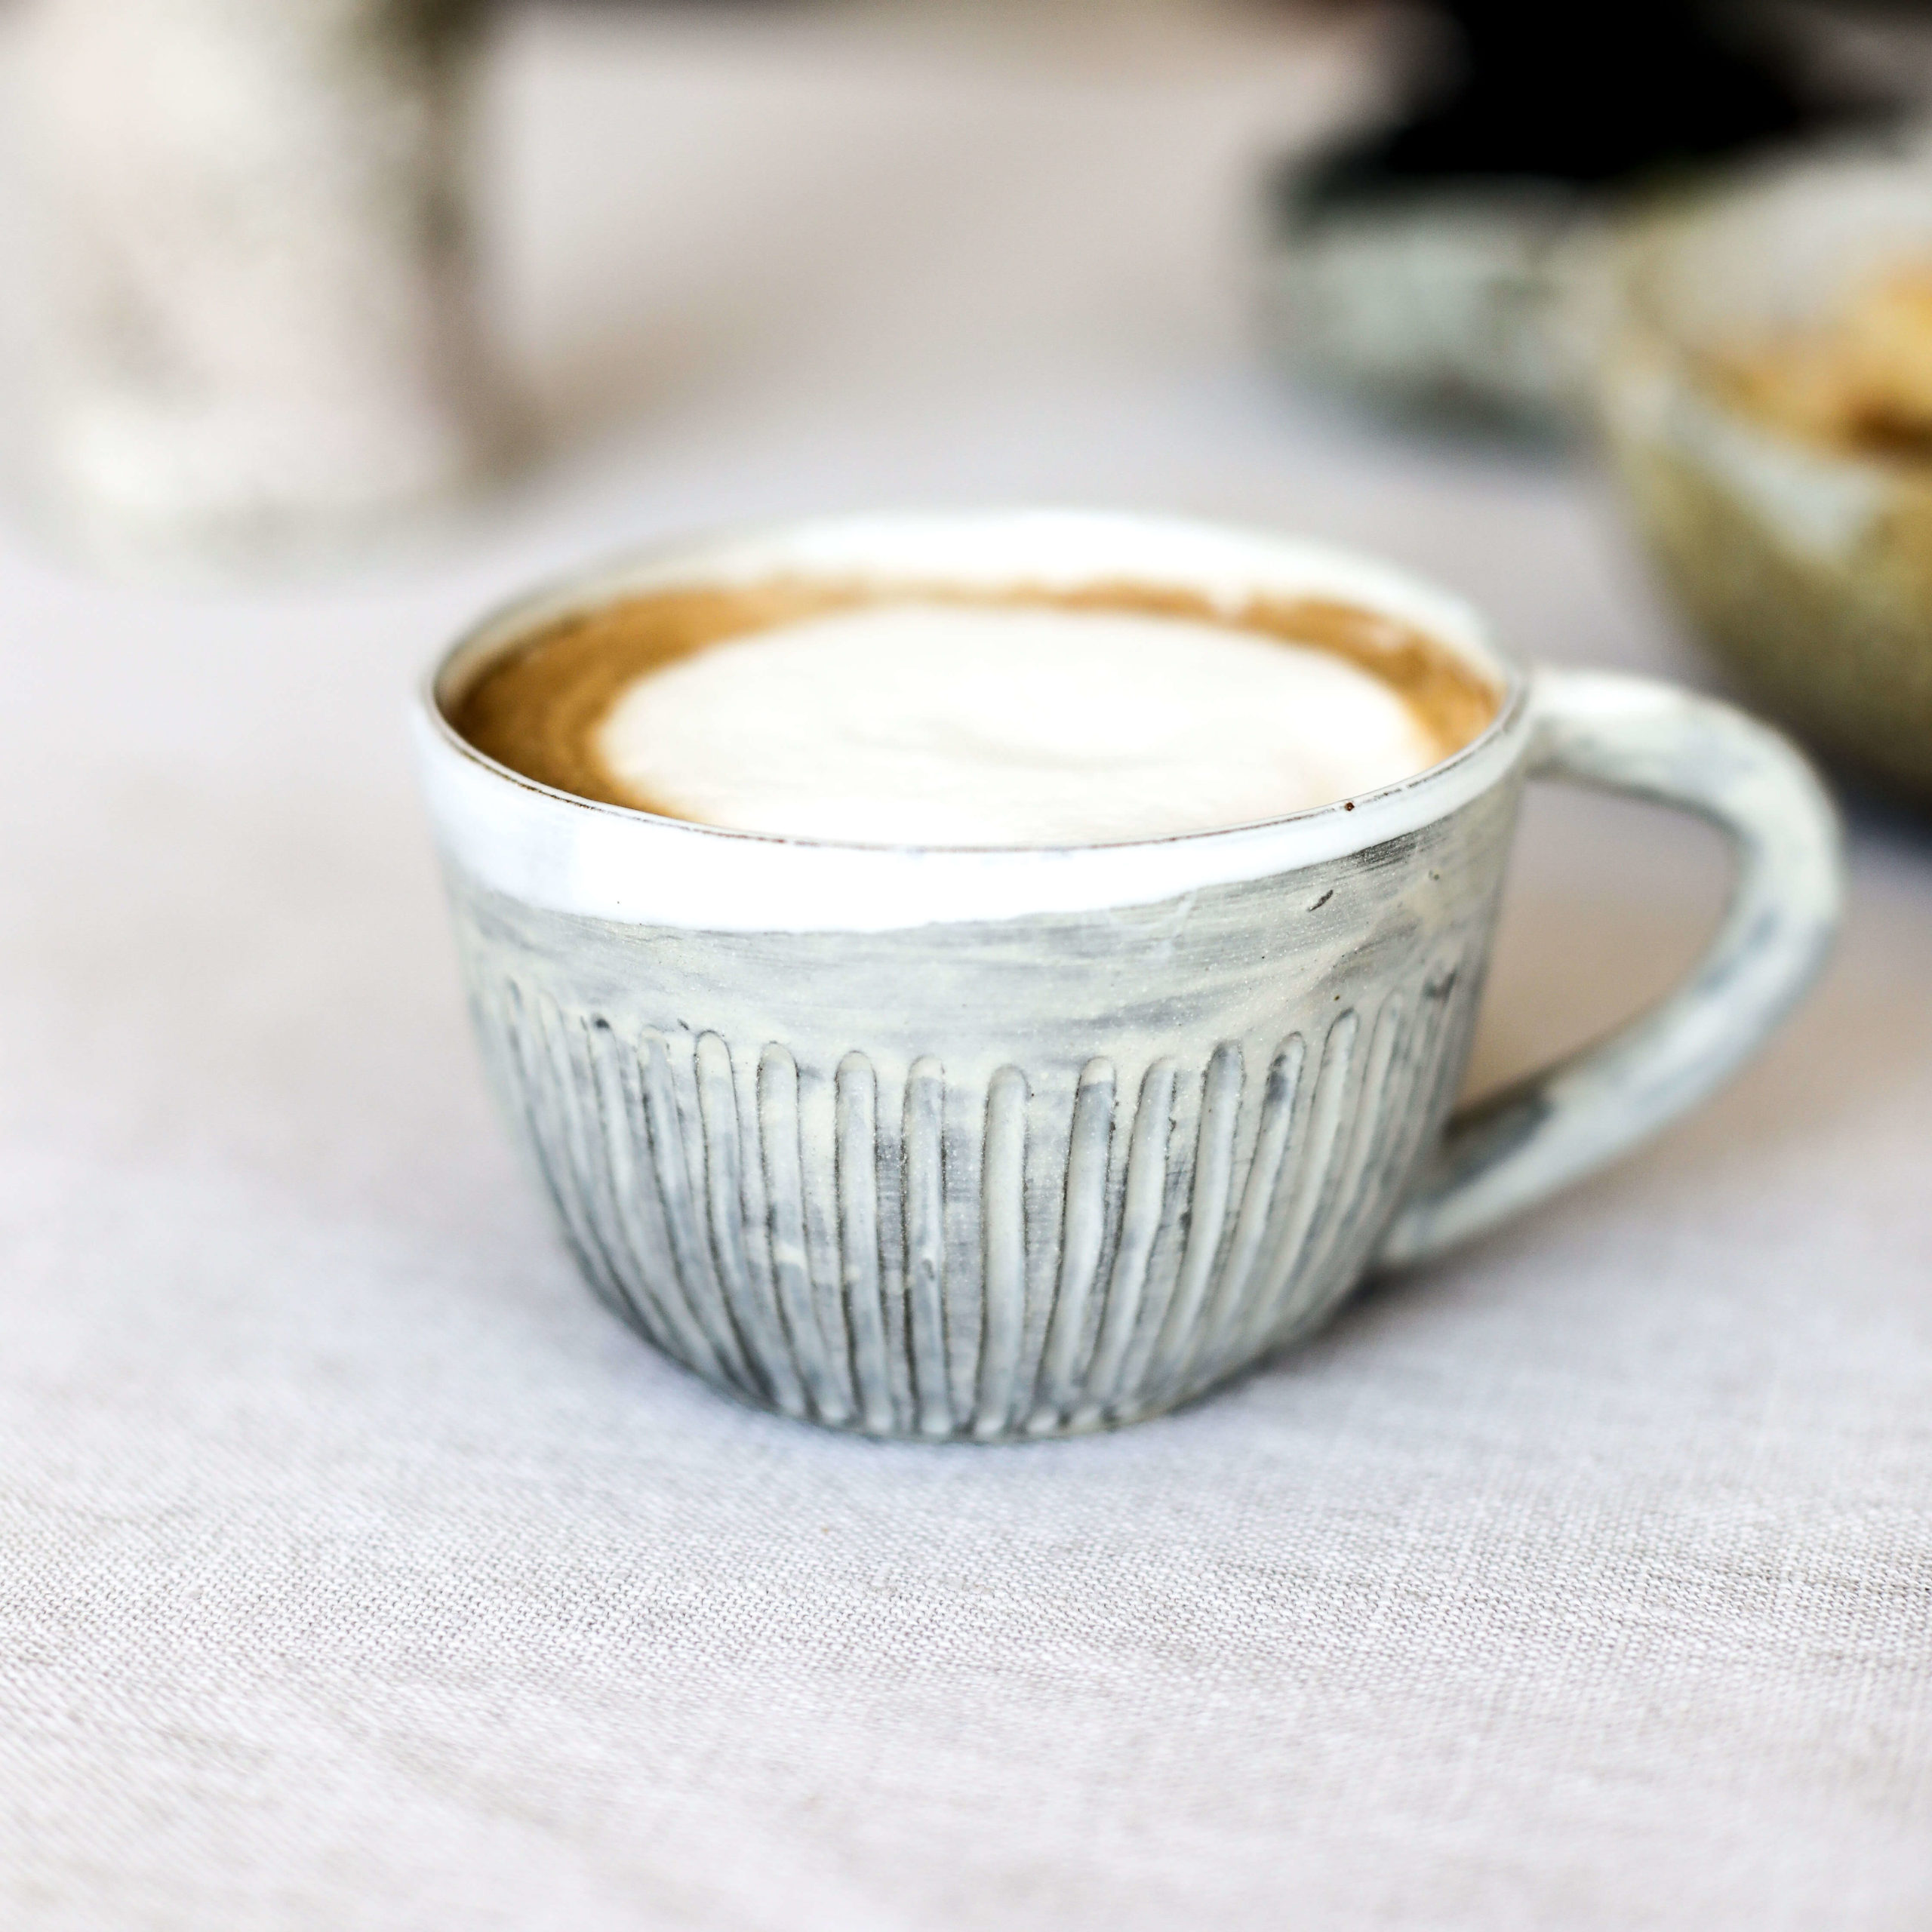 Keramik von Sweet pottery